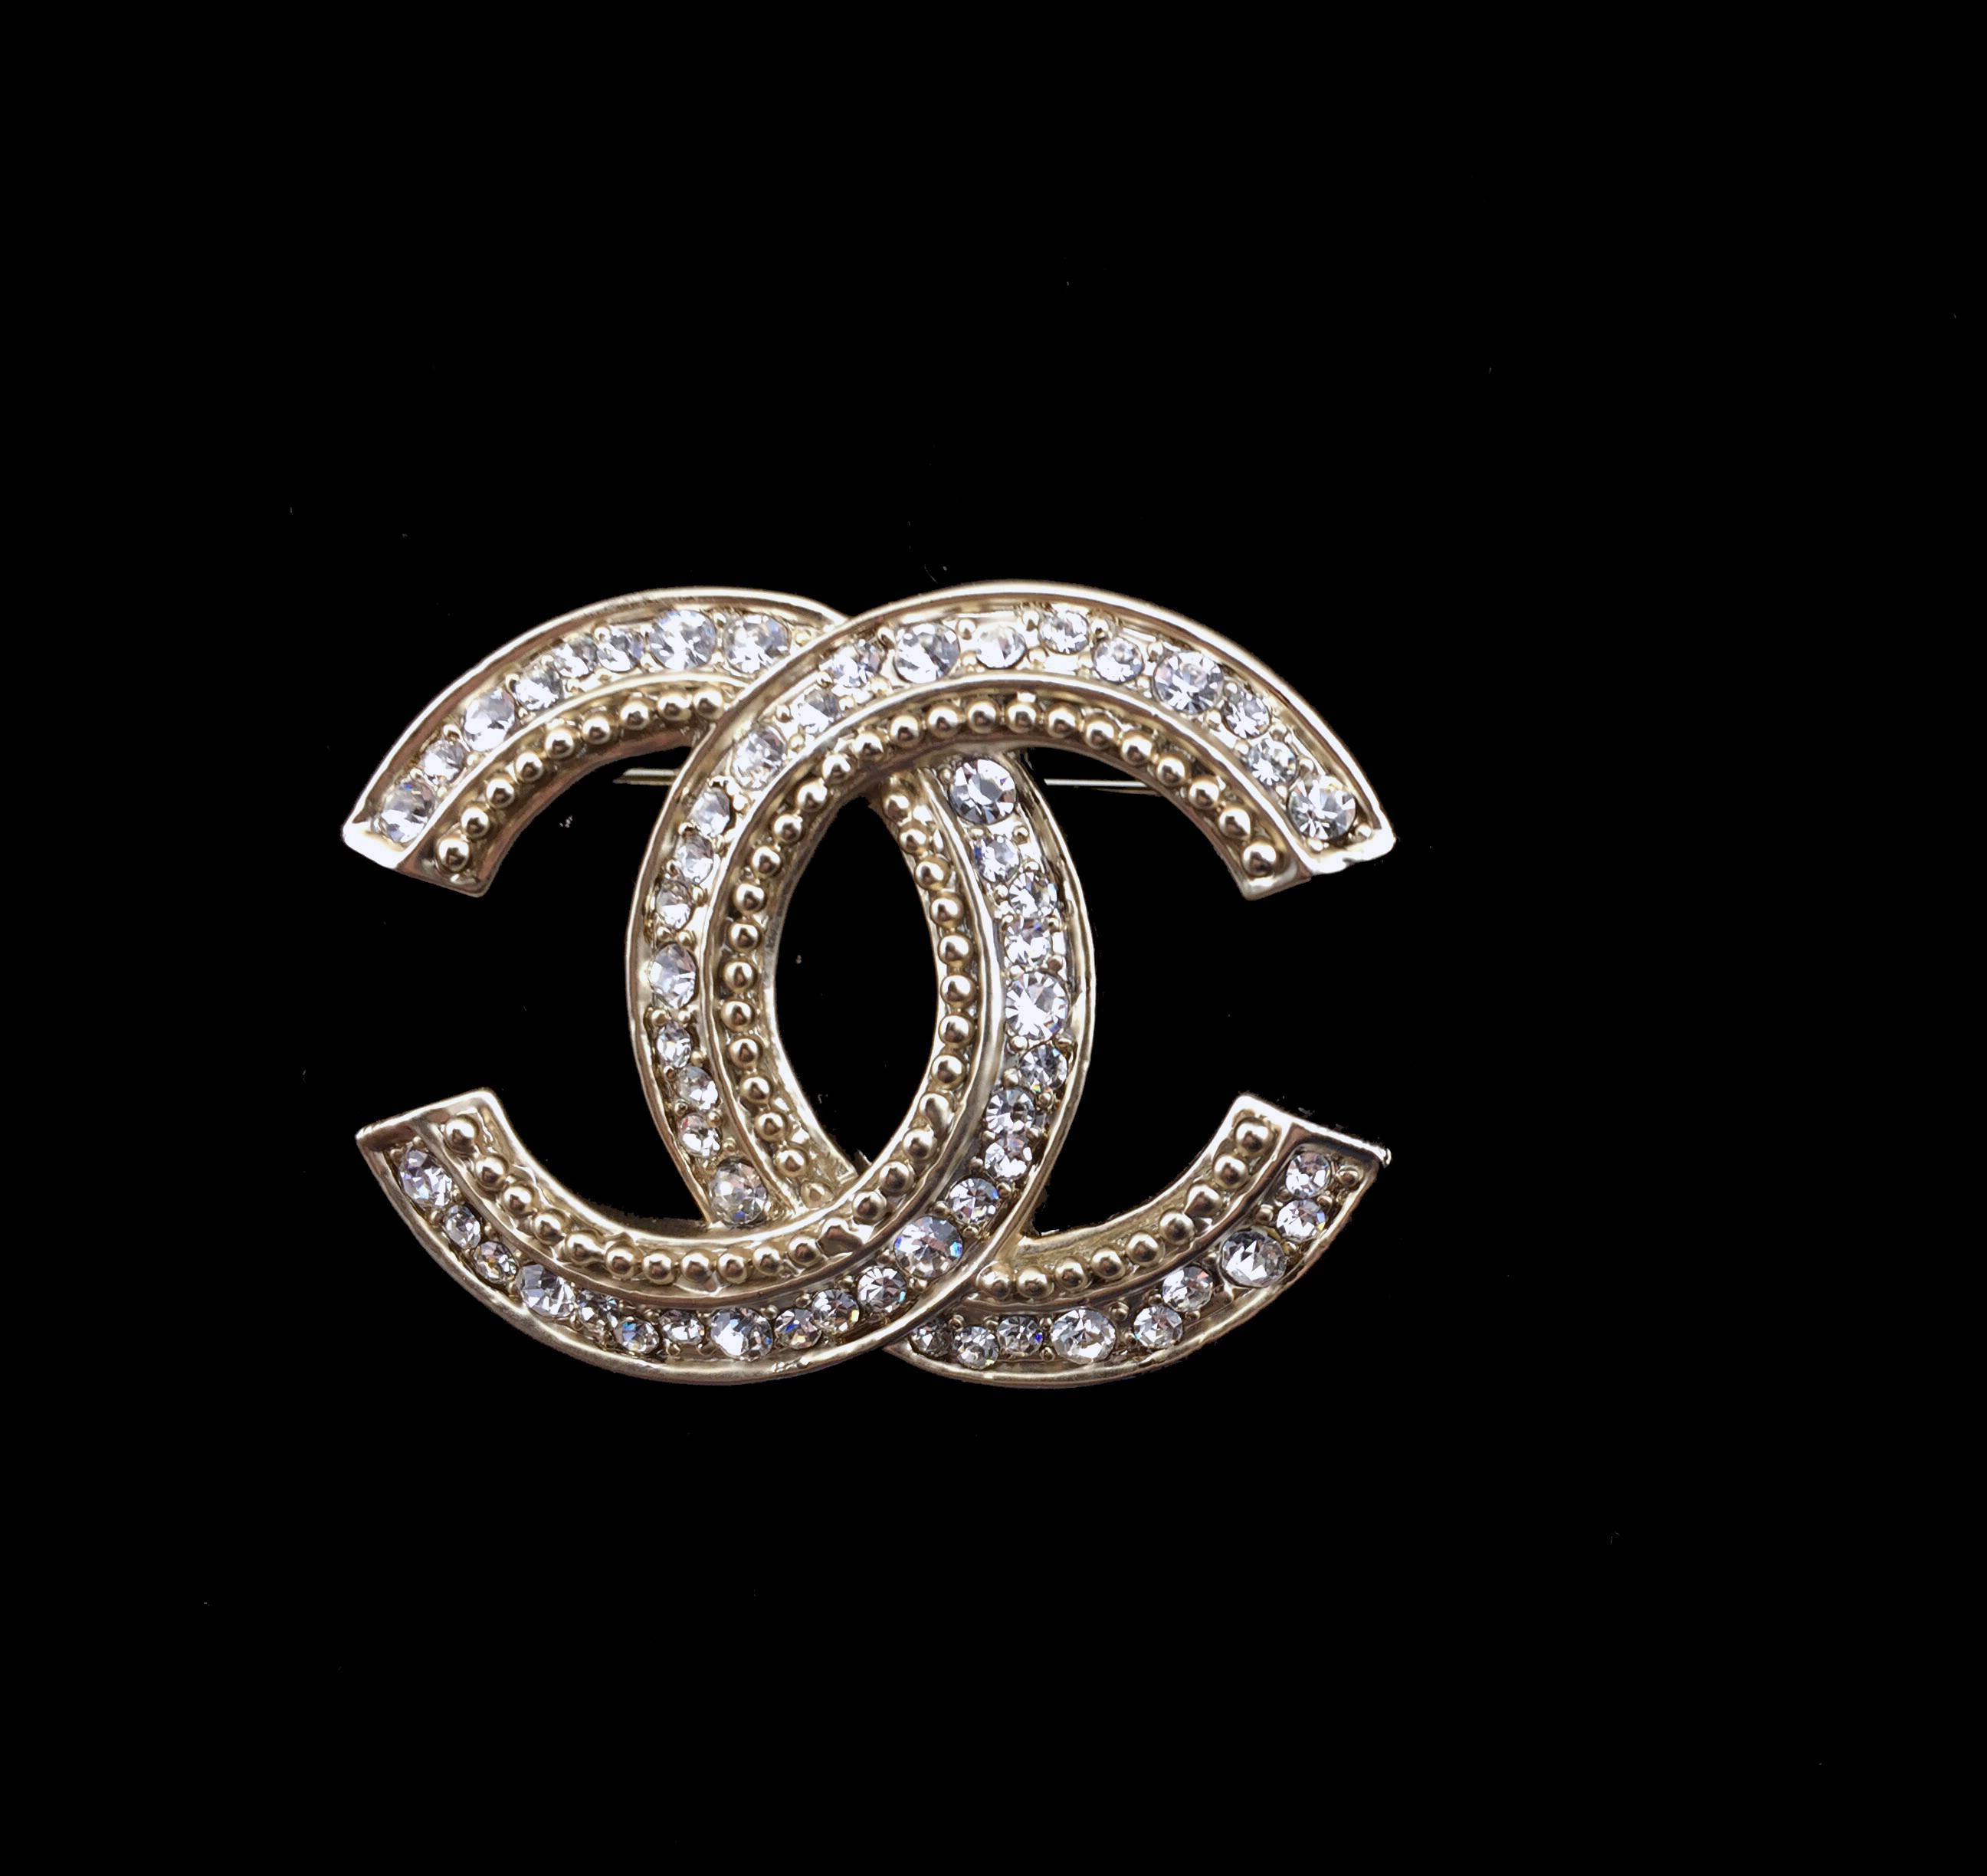 e8686b1b162 Gold Rhinestone Brooch Inspired